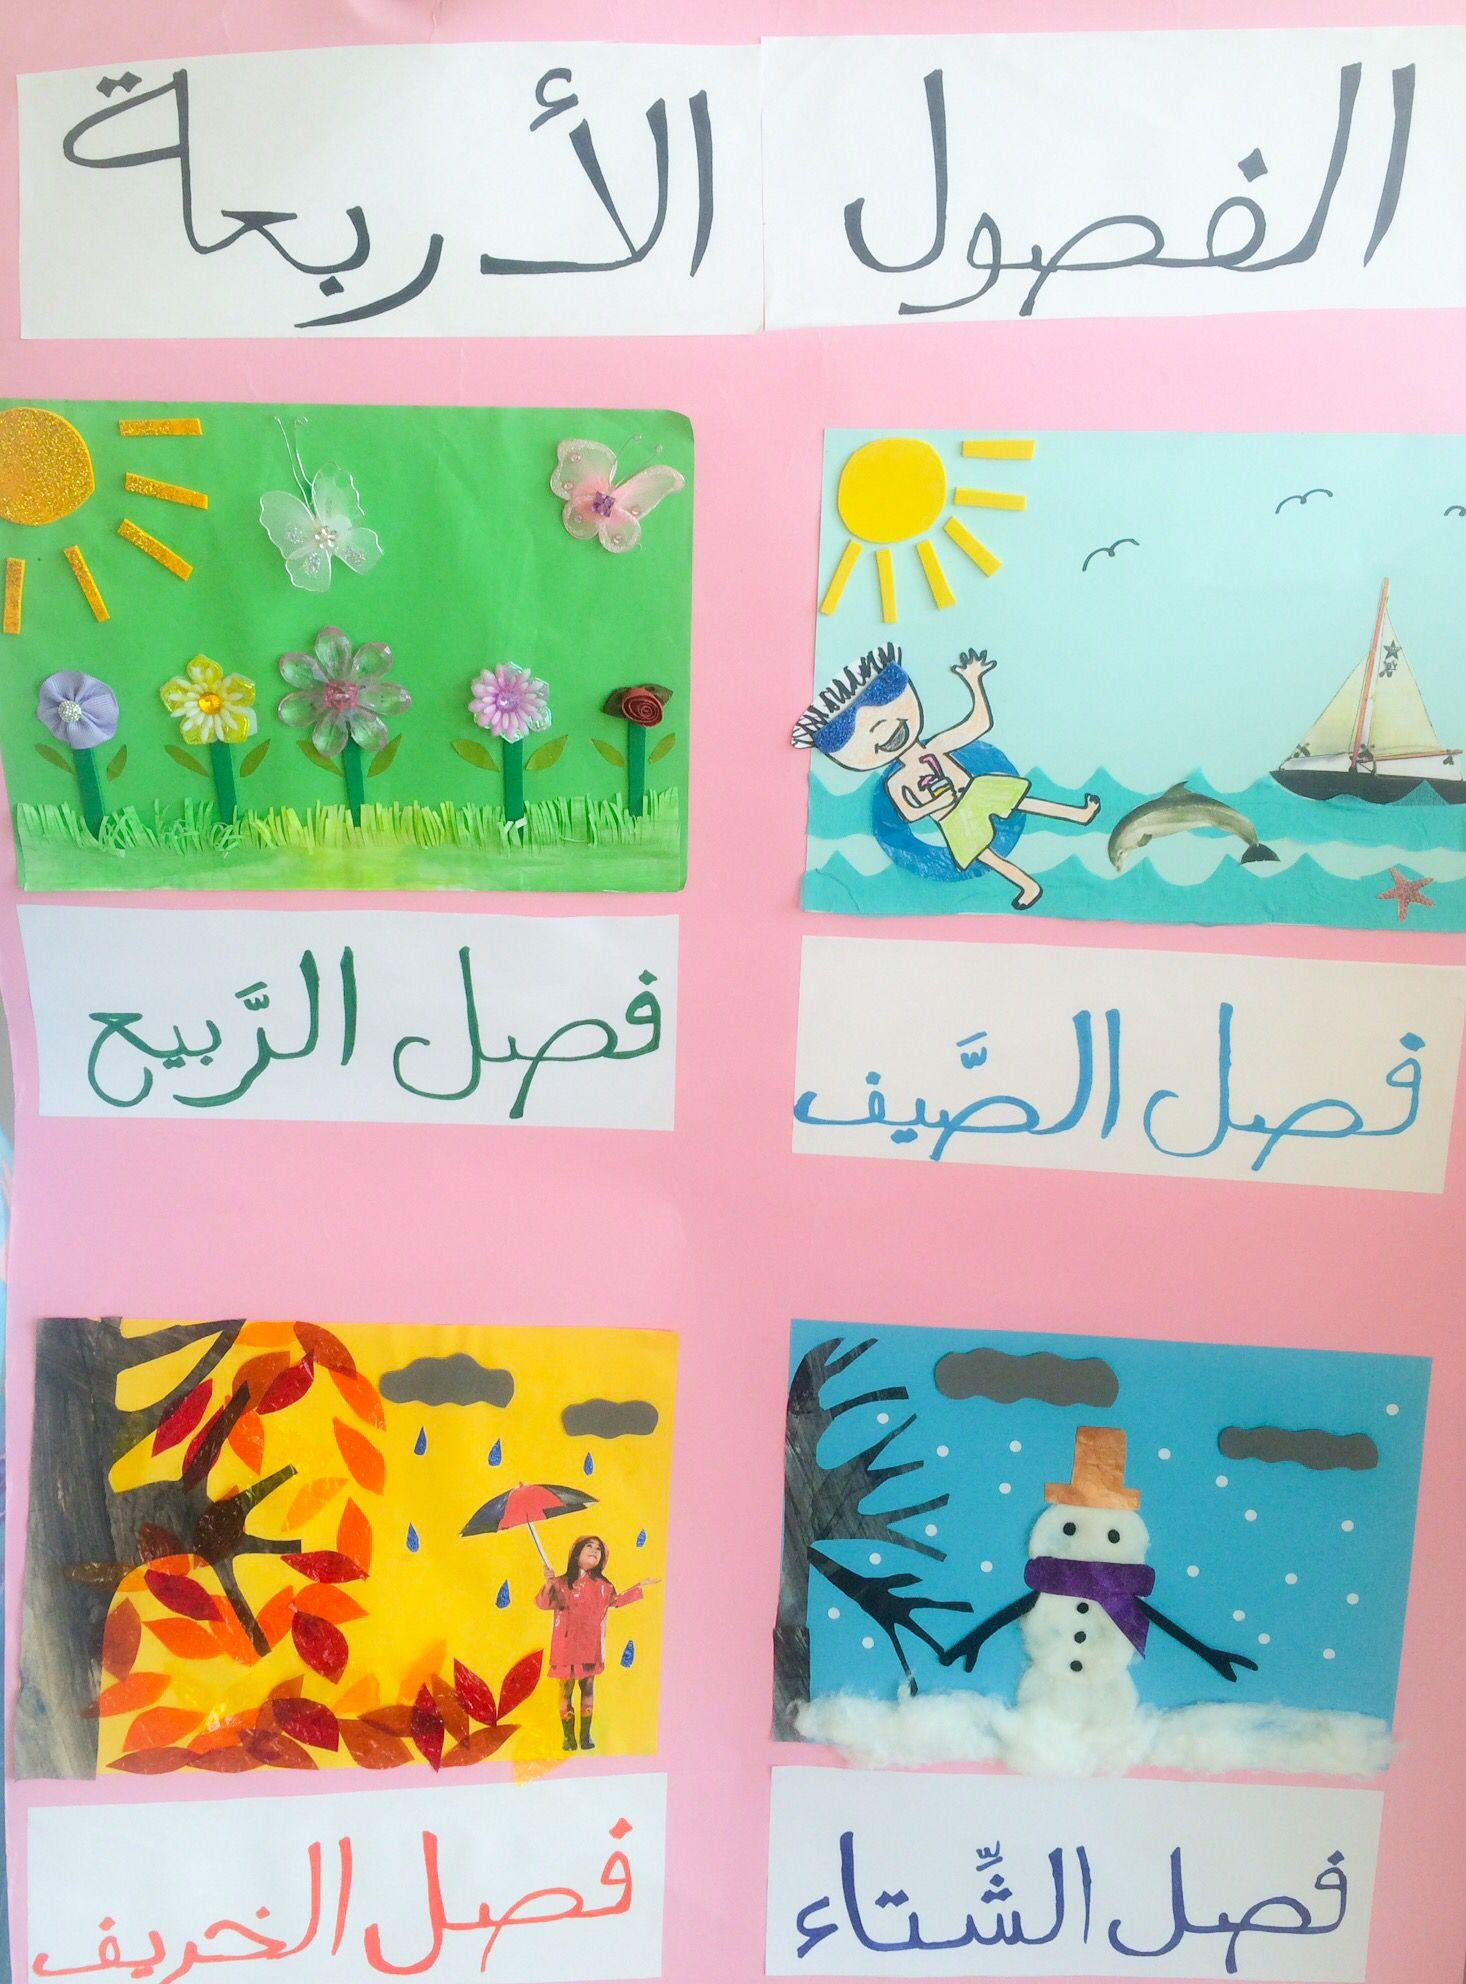 لوحة الفصول الاربعة The Four Seasons Project Summer Crafts For Kids Kids Education Graphic Organizers